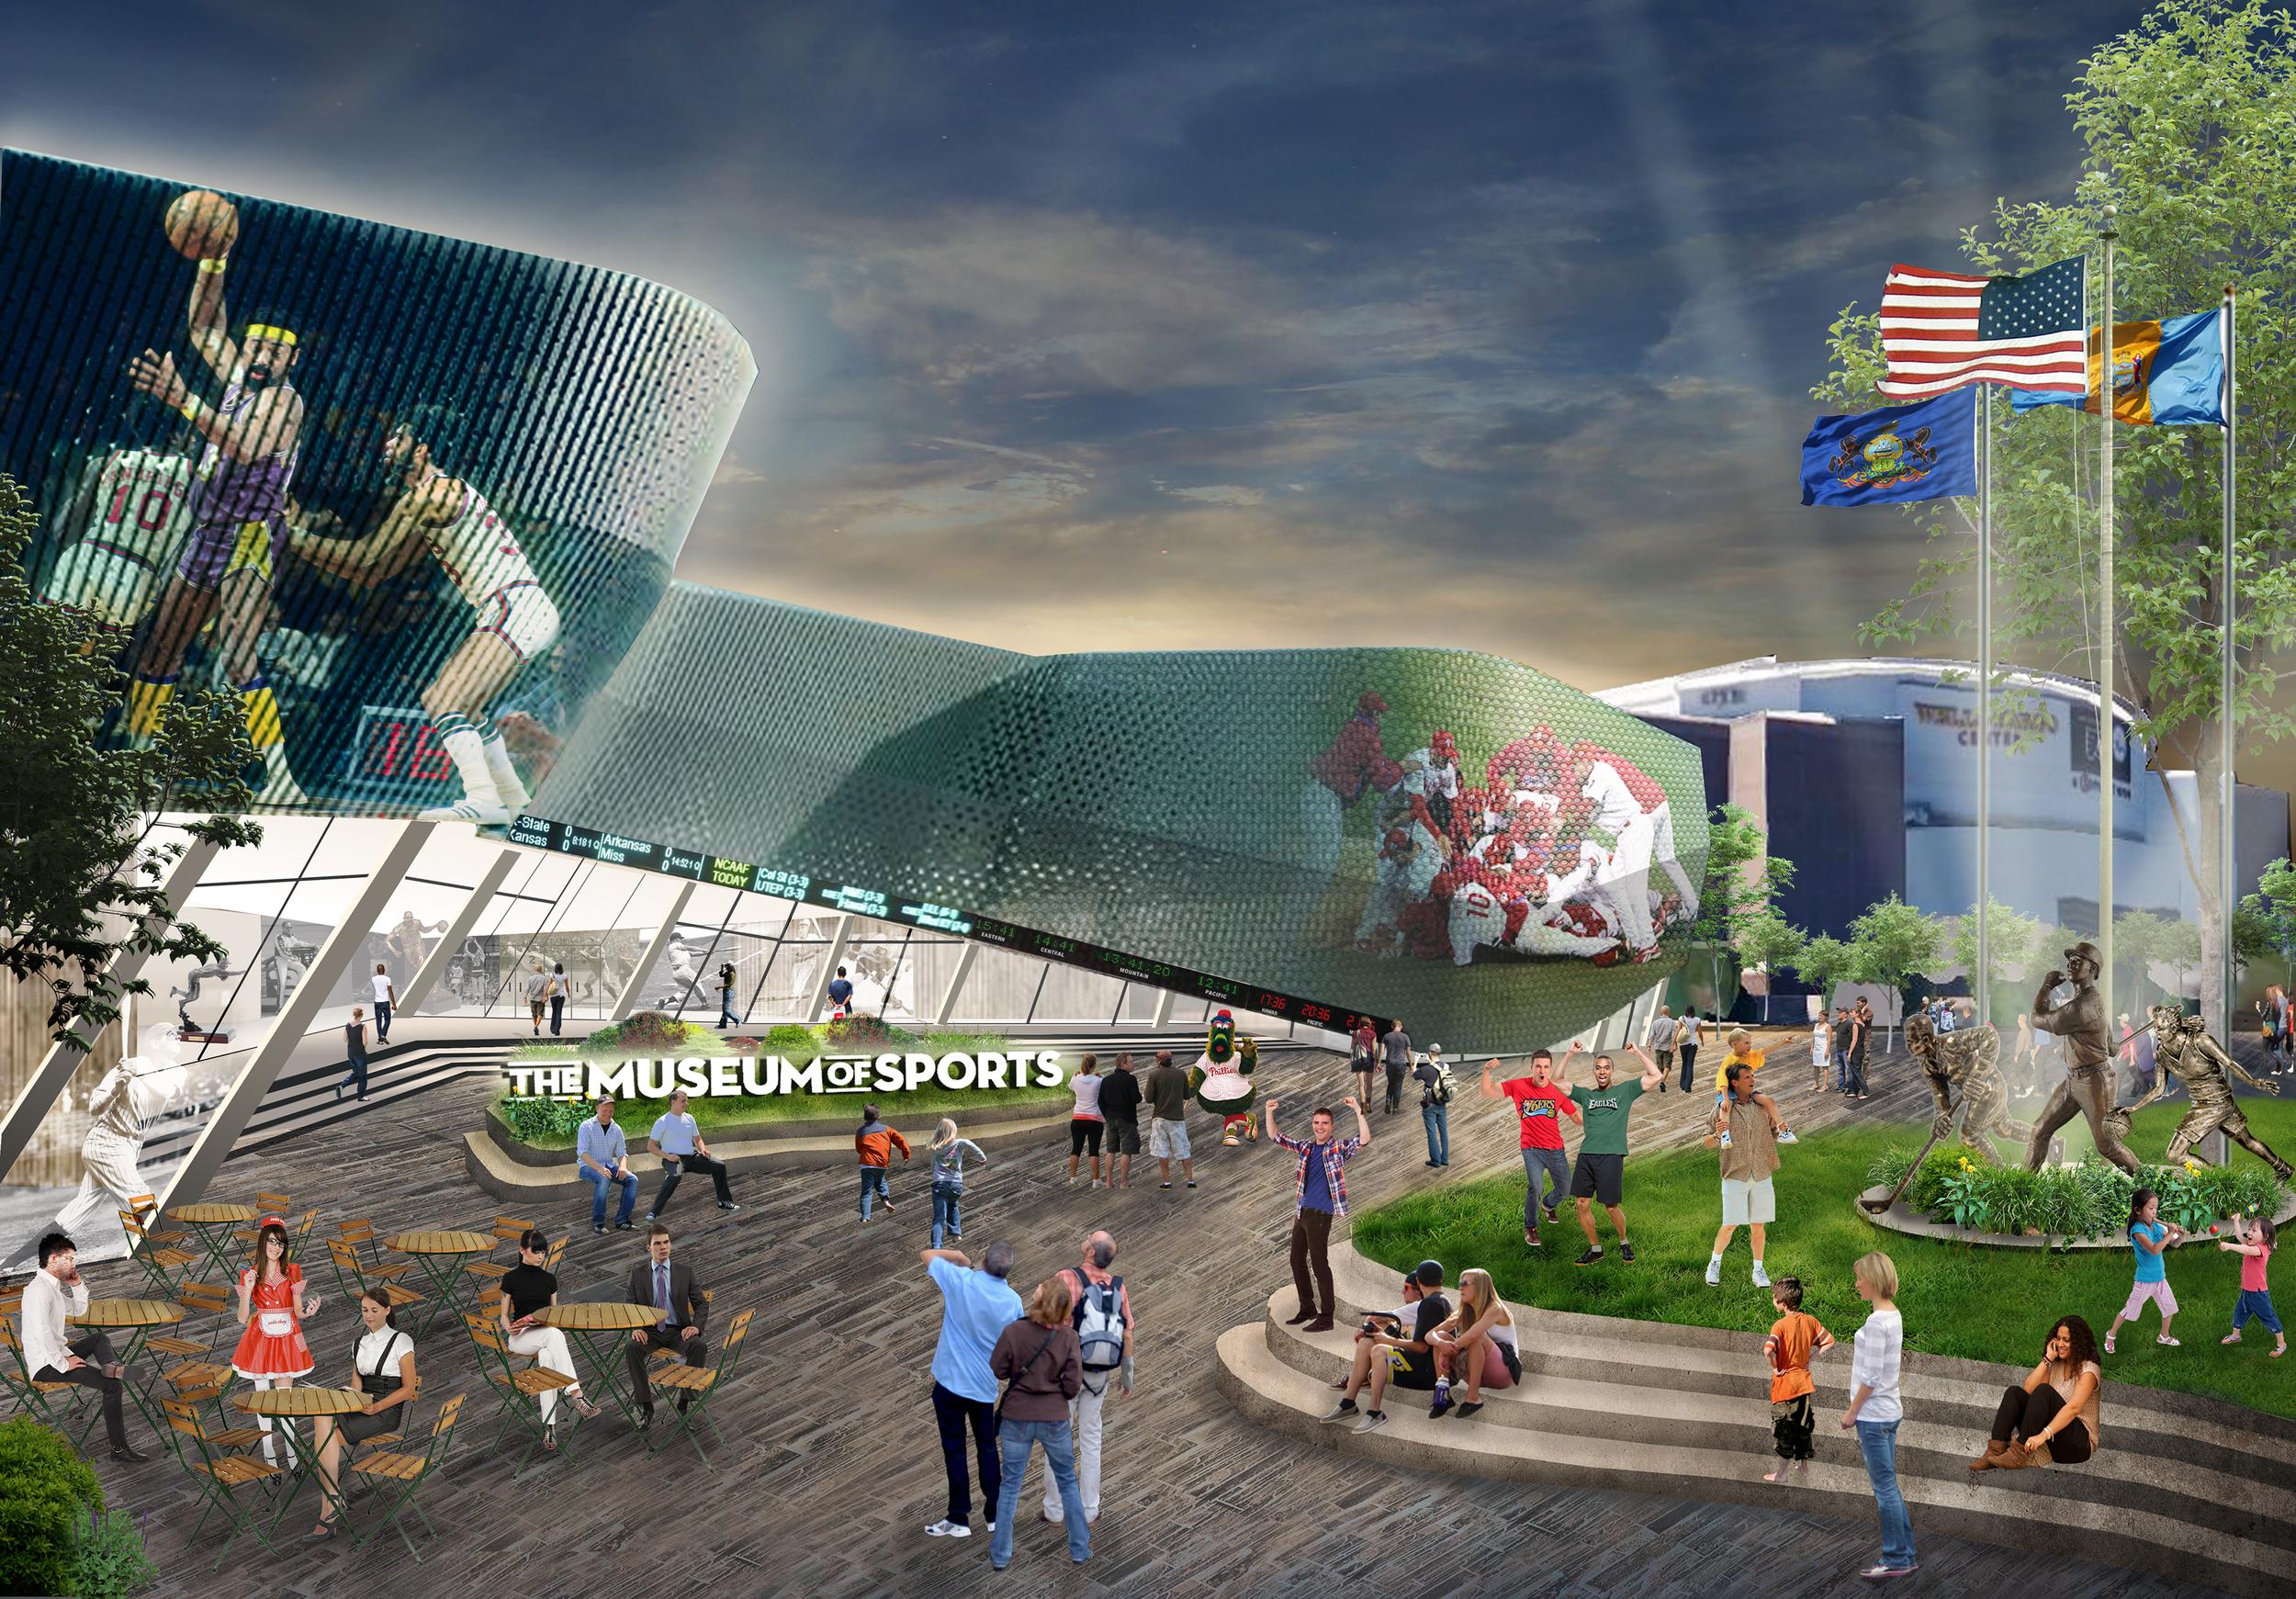 2014-11-11 Museum of Sports Hi-Res.jpg